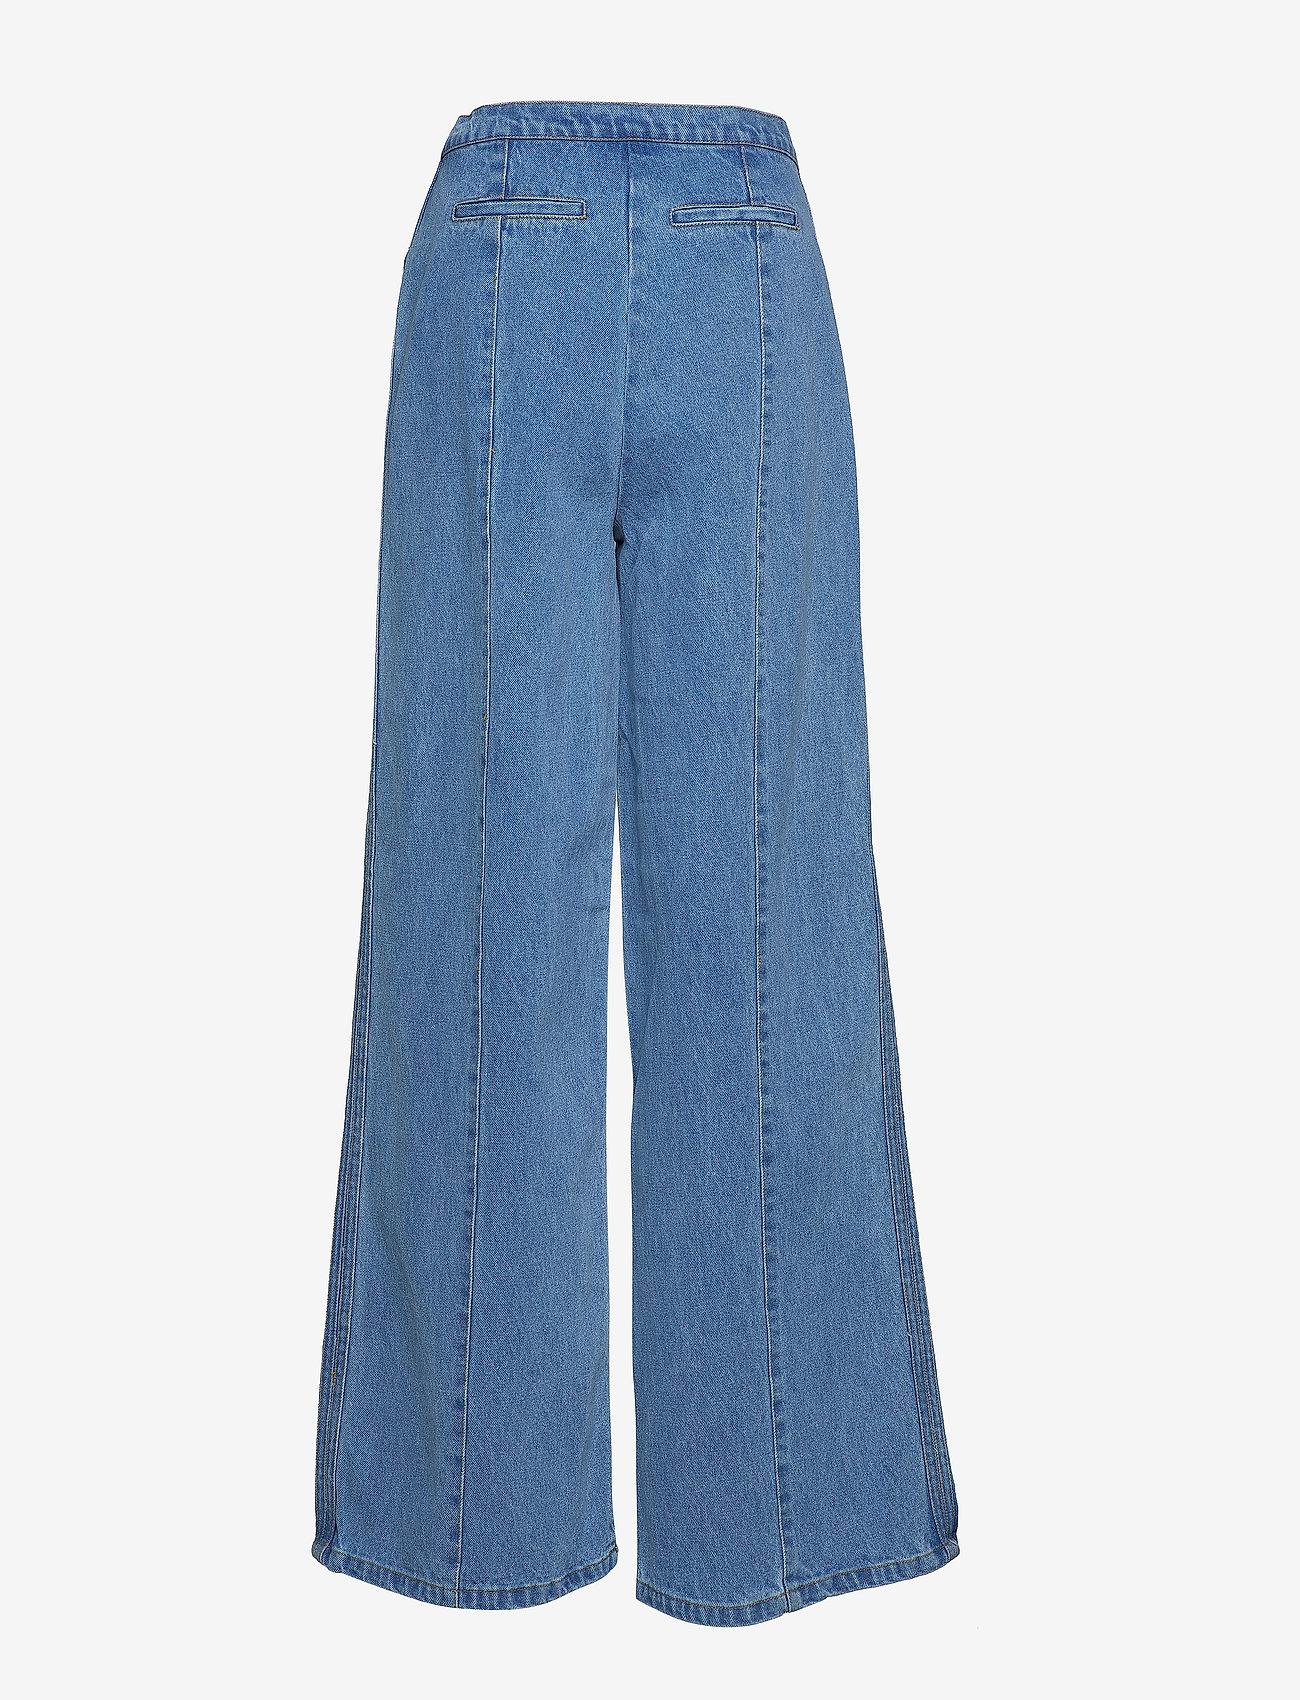 Stella Nova Merisa - Jeans WASHED DENIM